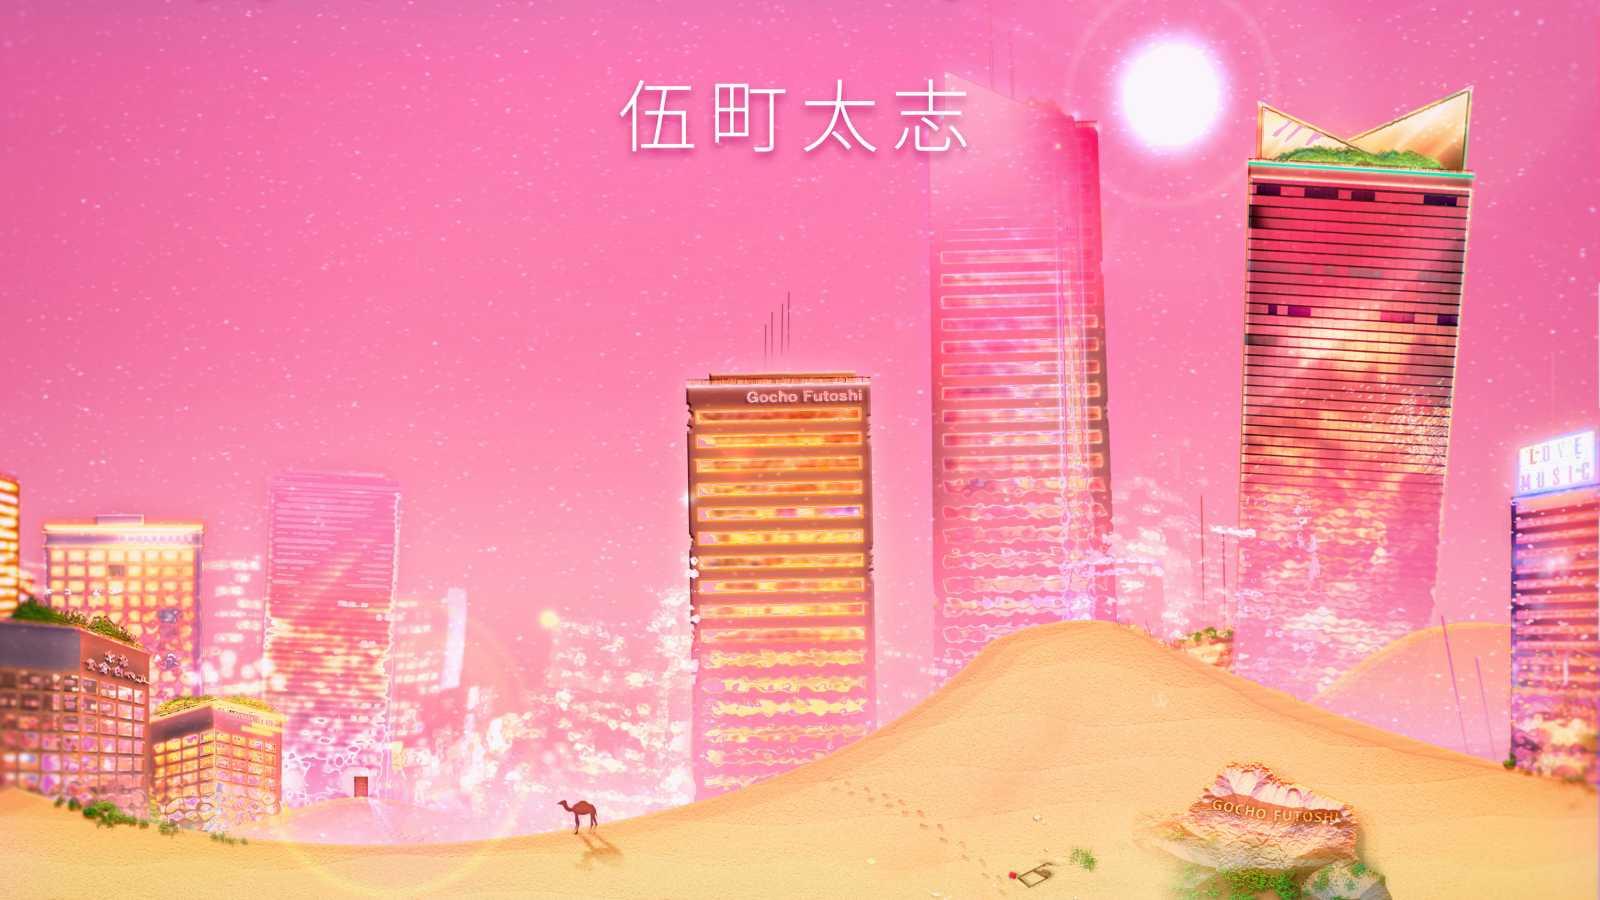 Fourth Single from GOCHO Futoshi © GOCHO Futoshi. All rights reserved.